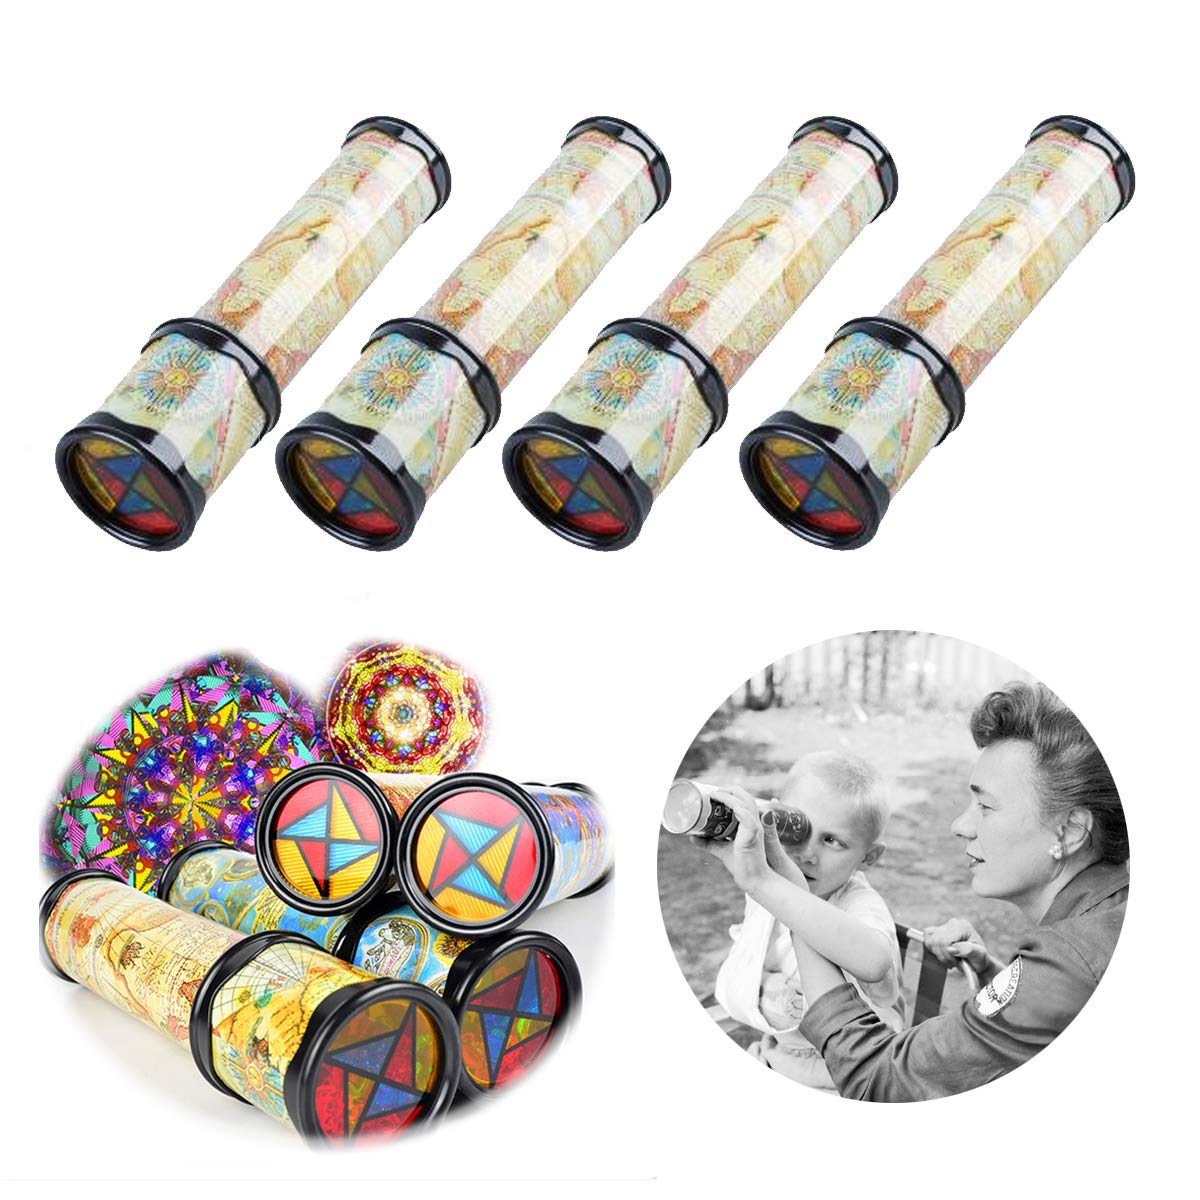 DLOnline 4PCS Old World Kaleidoscope Magic Classic Toy for Children